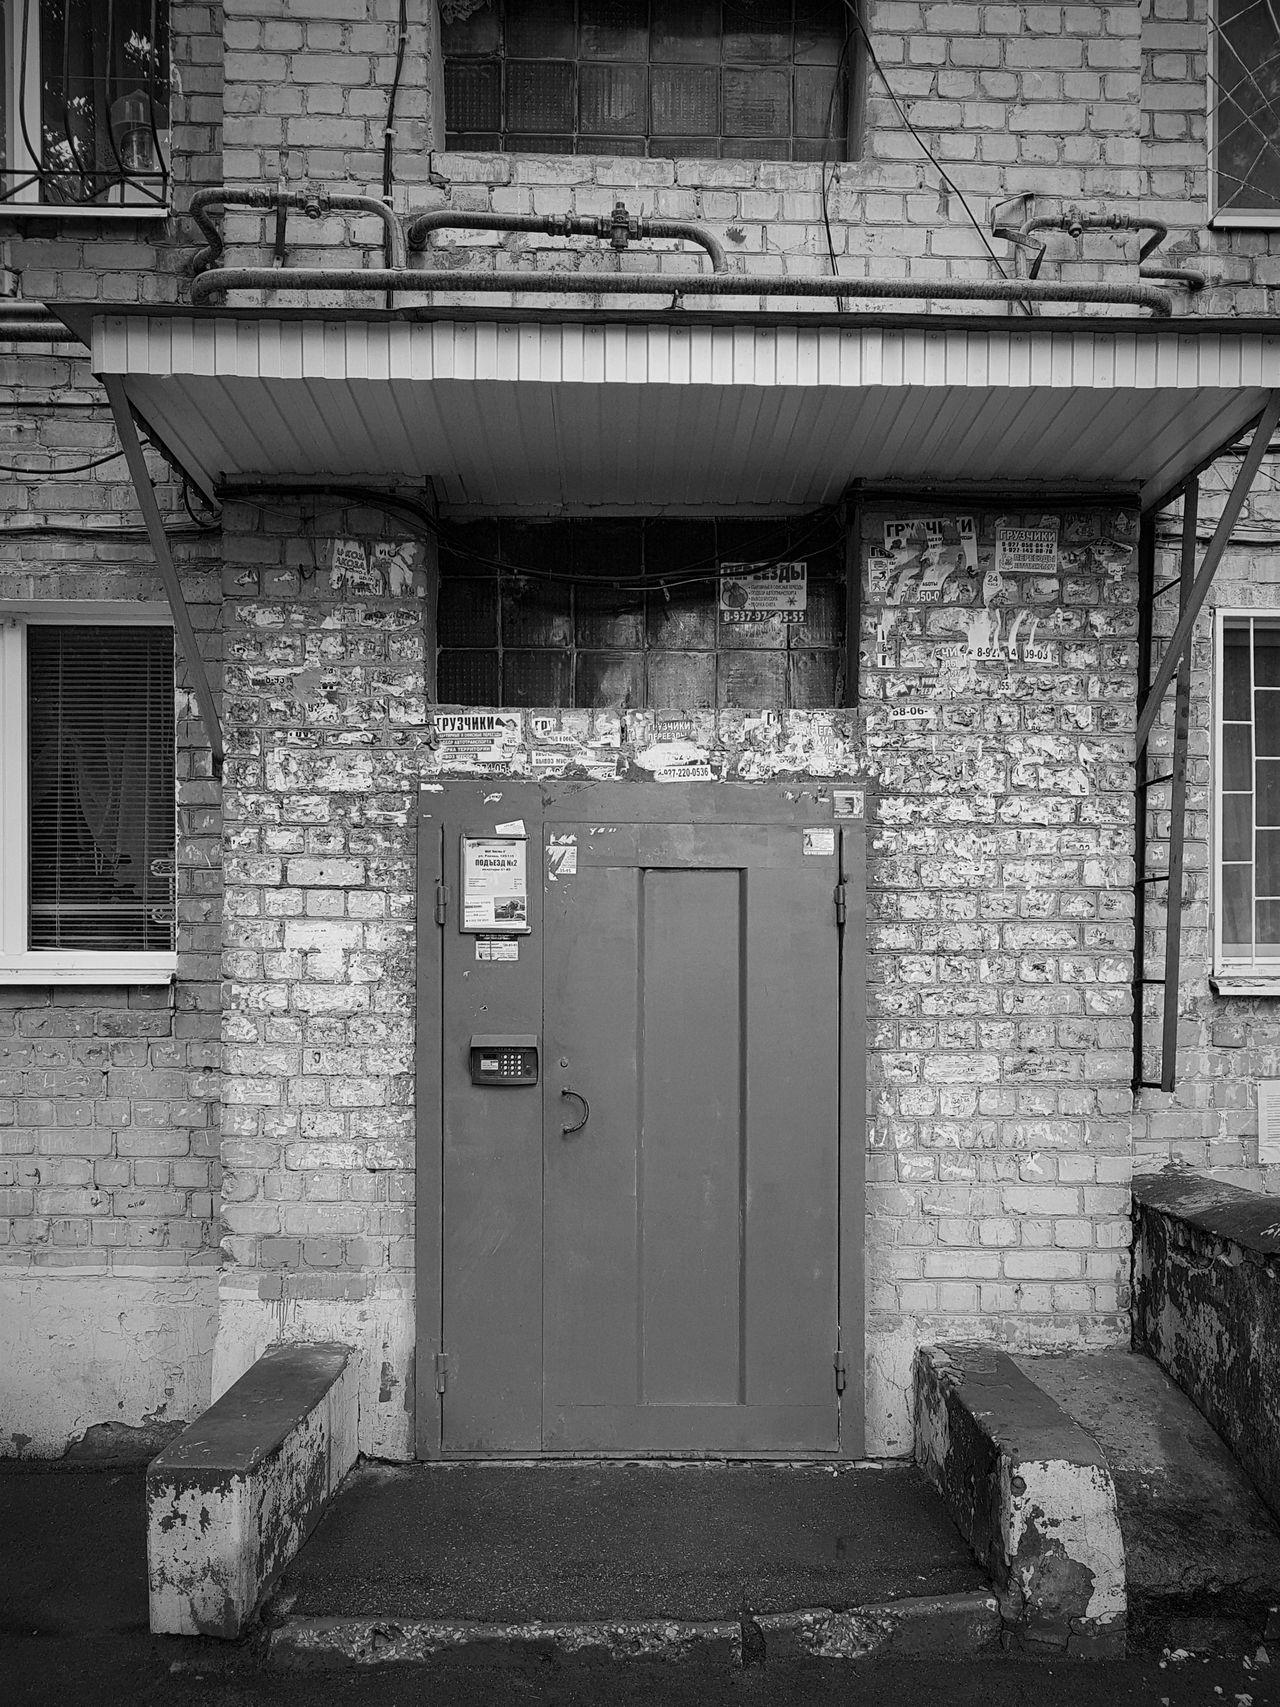 Built Structure Architecture Door Building Exterior Day No People Outdoors Monochrome Black & White Black And White Blackandwhite Residential Building Apartment Architecture